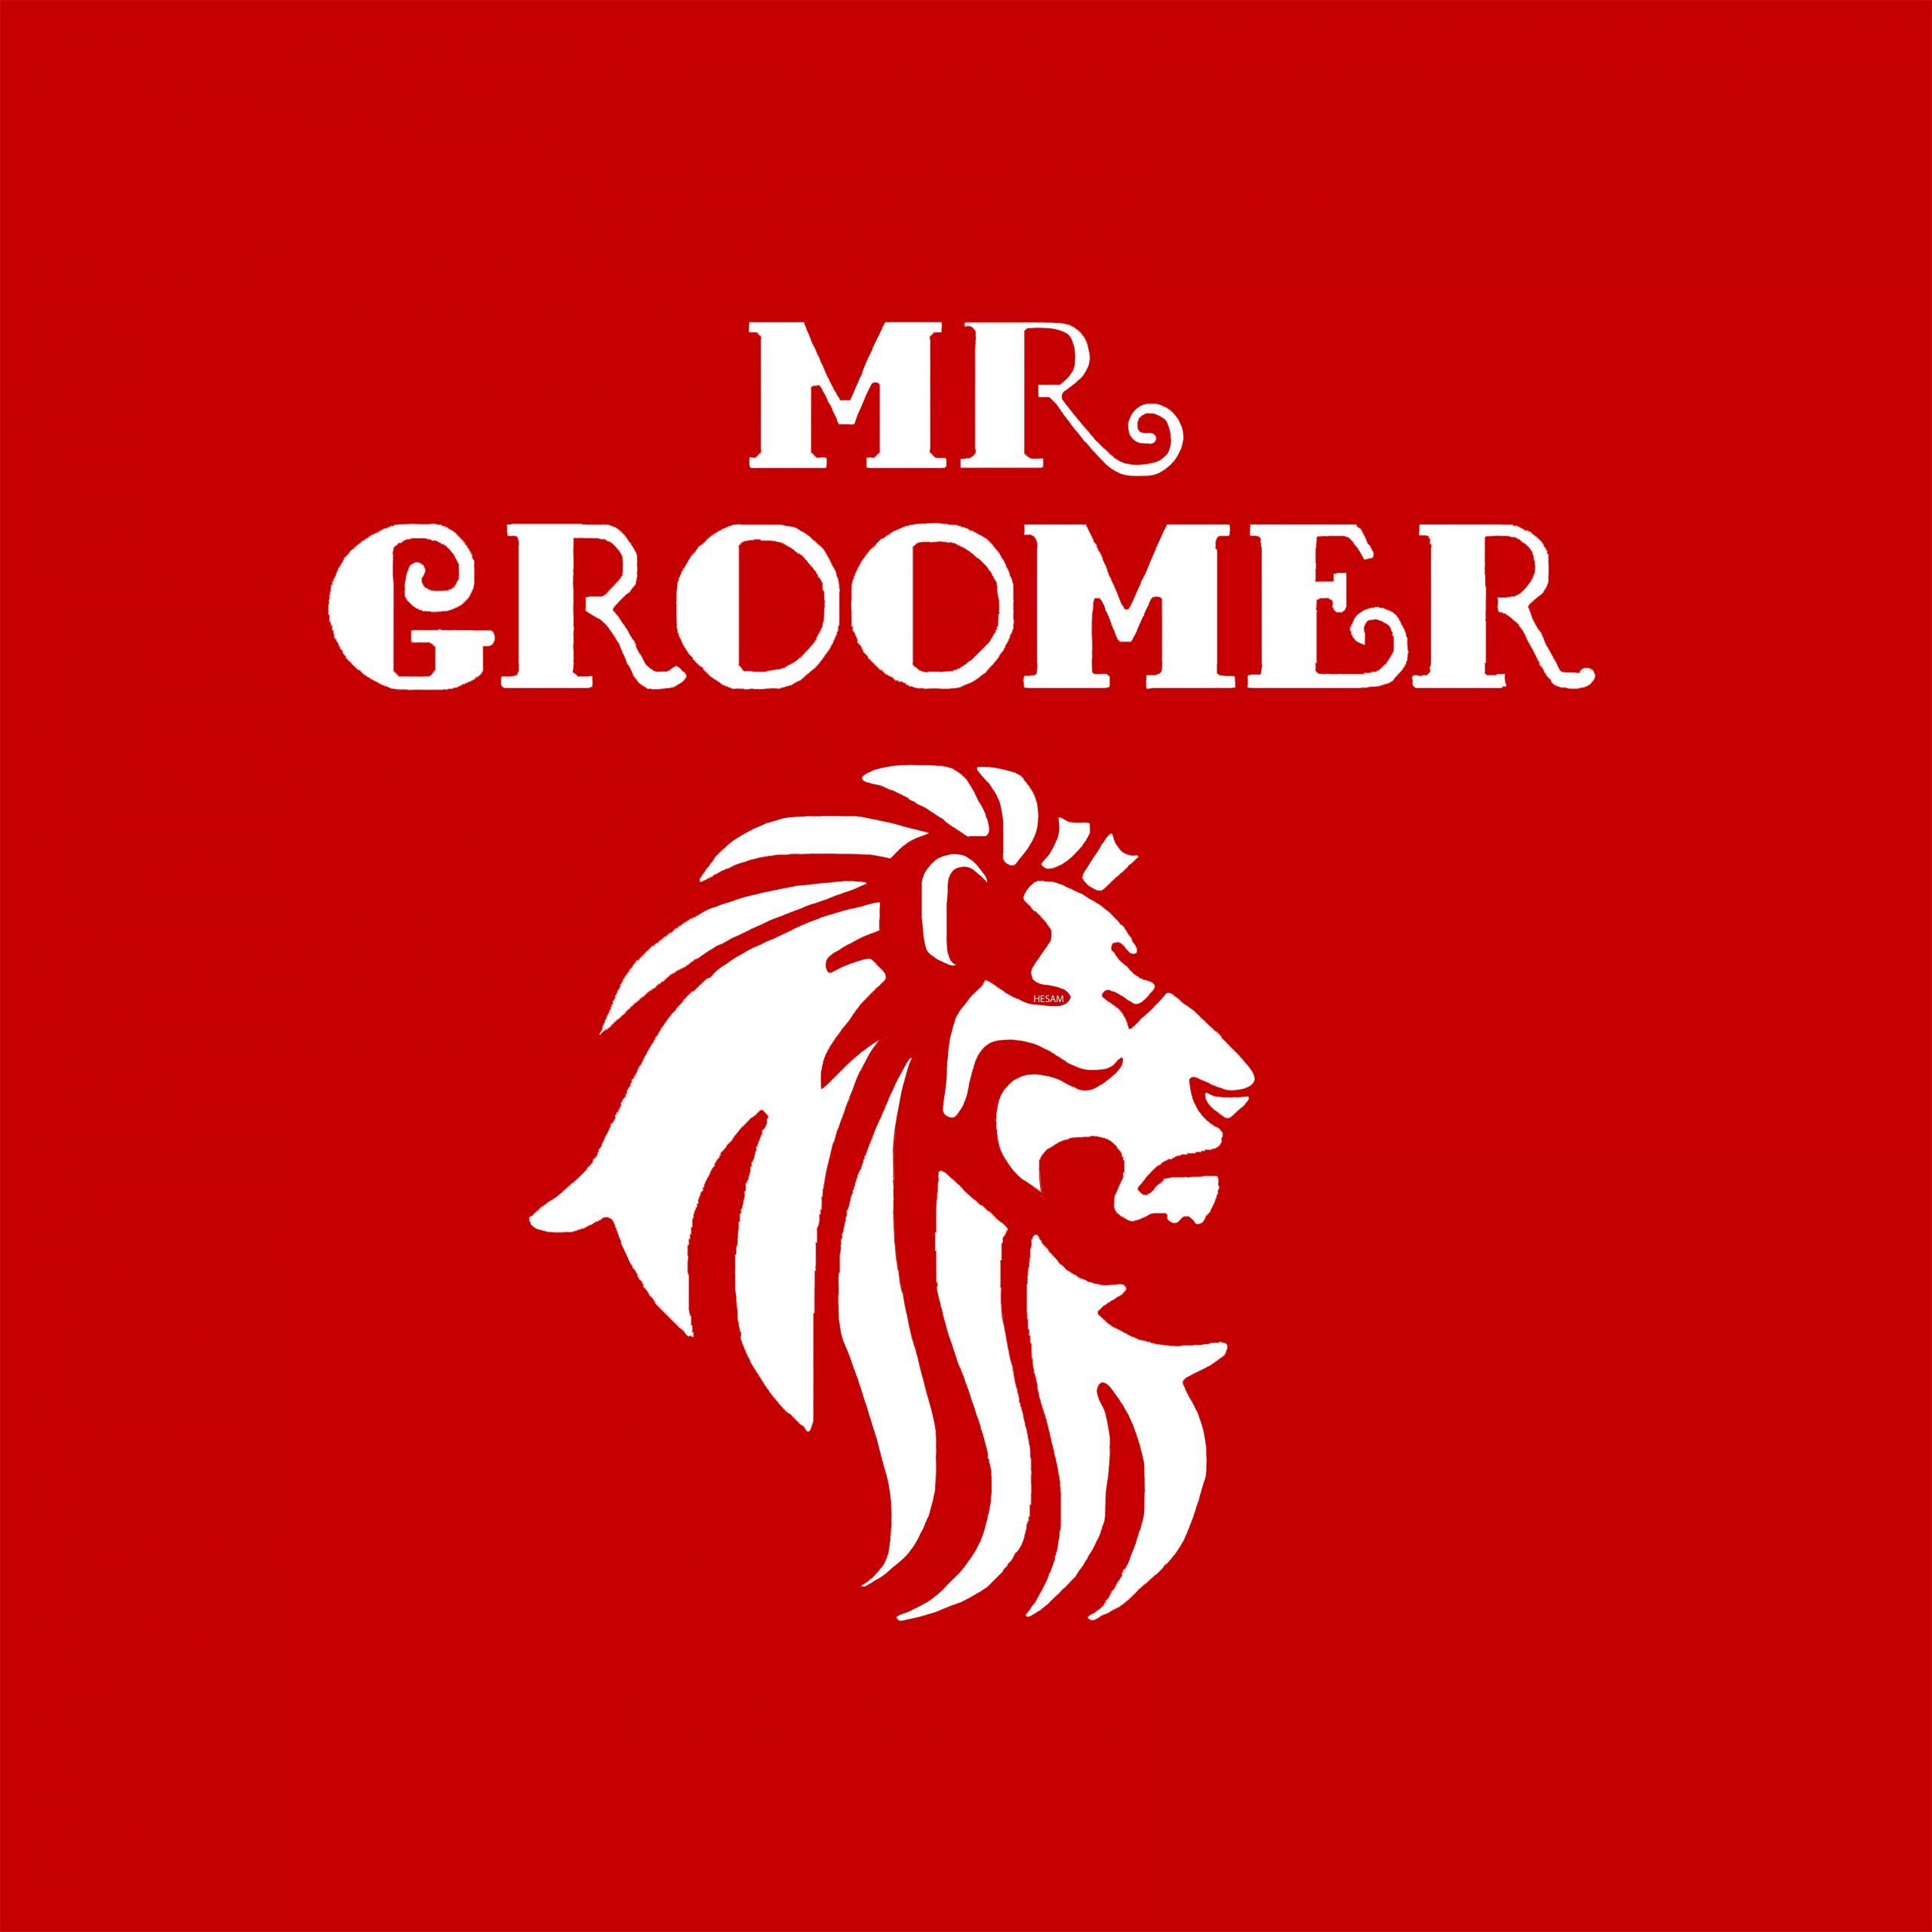 WWW.GROOMER.IR